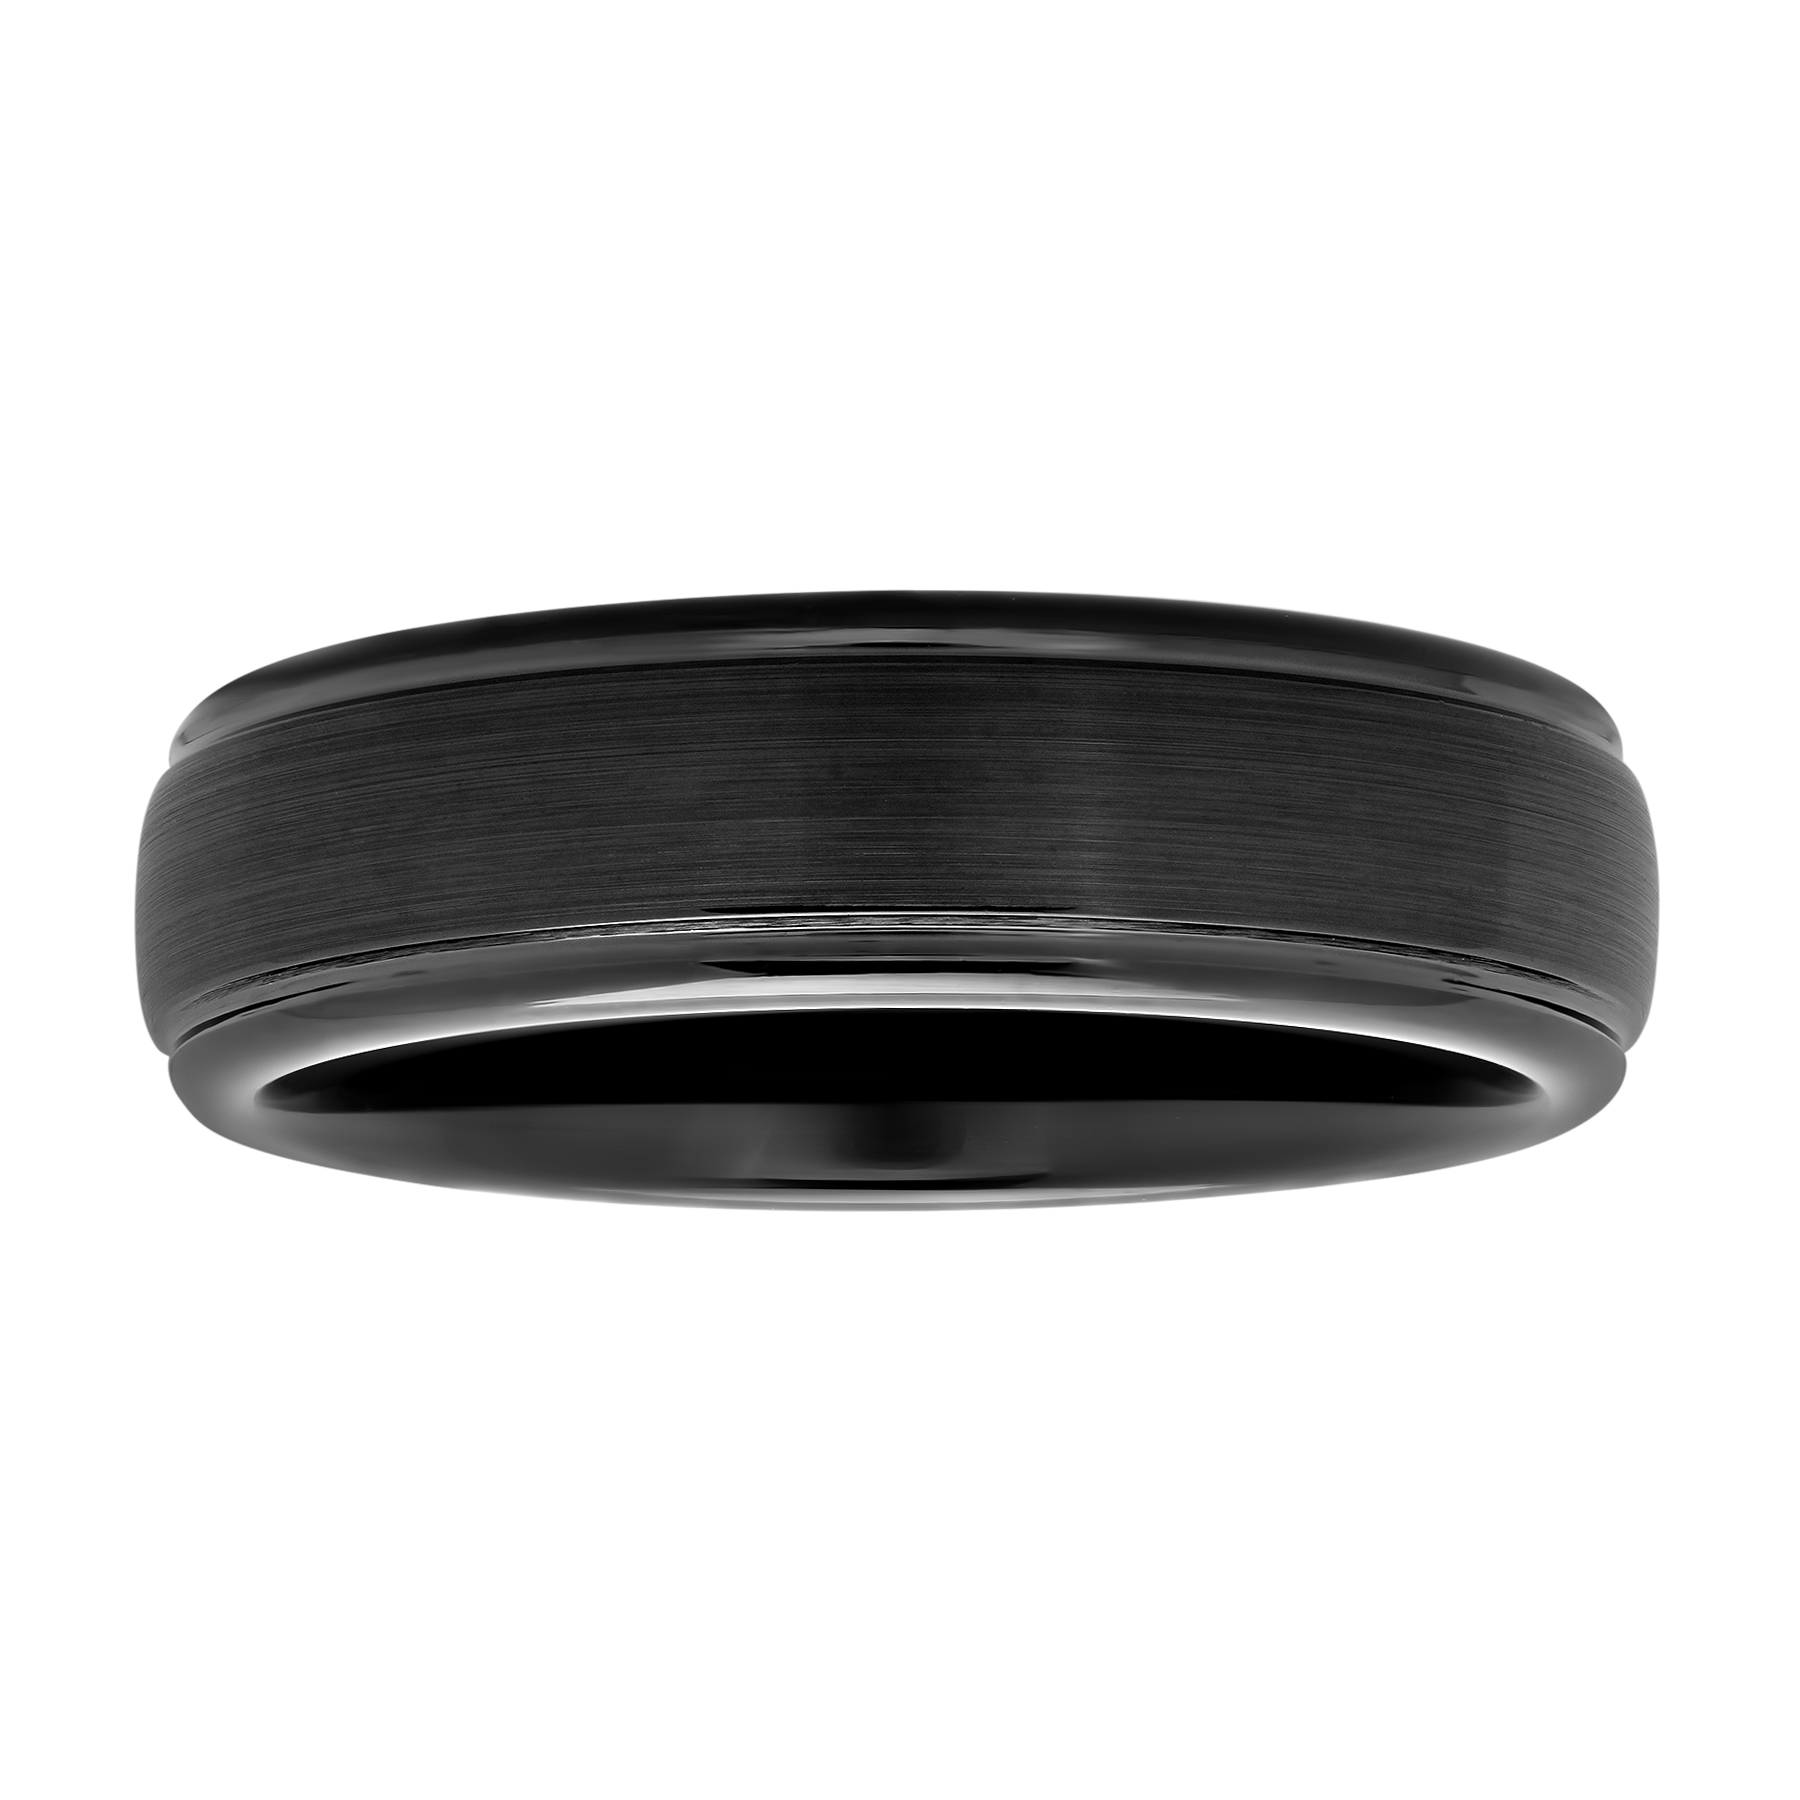 hinged wedding ring Men s Black IP Tungsten 6MM Comfort Fit Domed Wedding Band Mens Ring